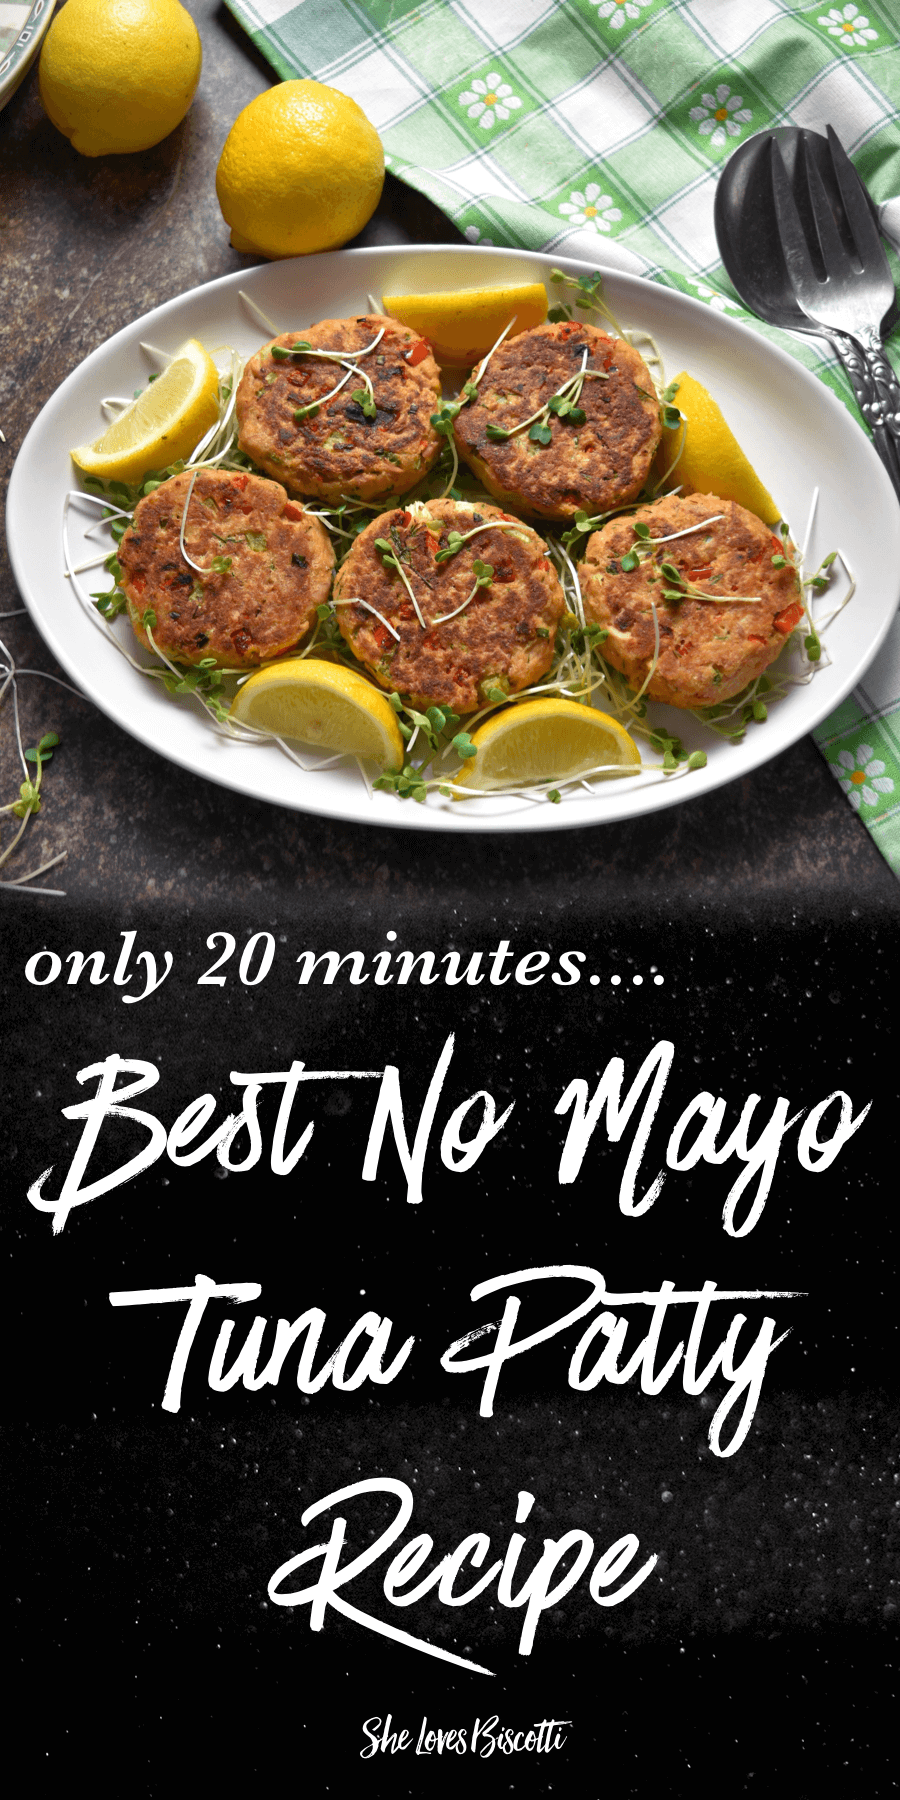 Best No Mayo Tuna Patty Recipe shown on a white serving platter.